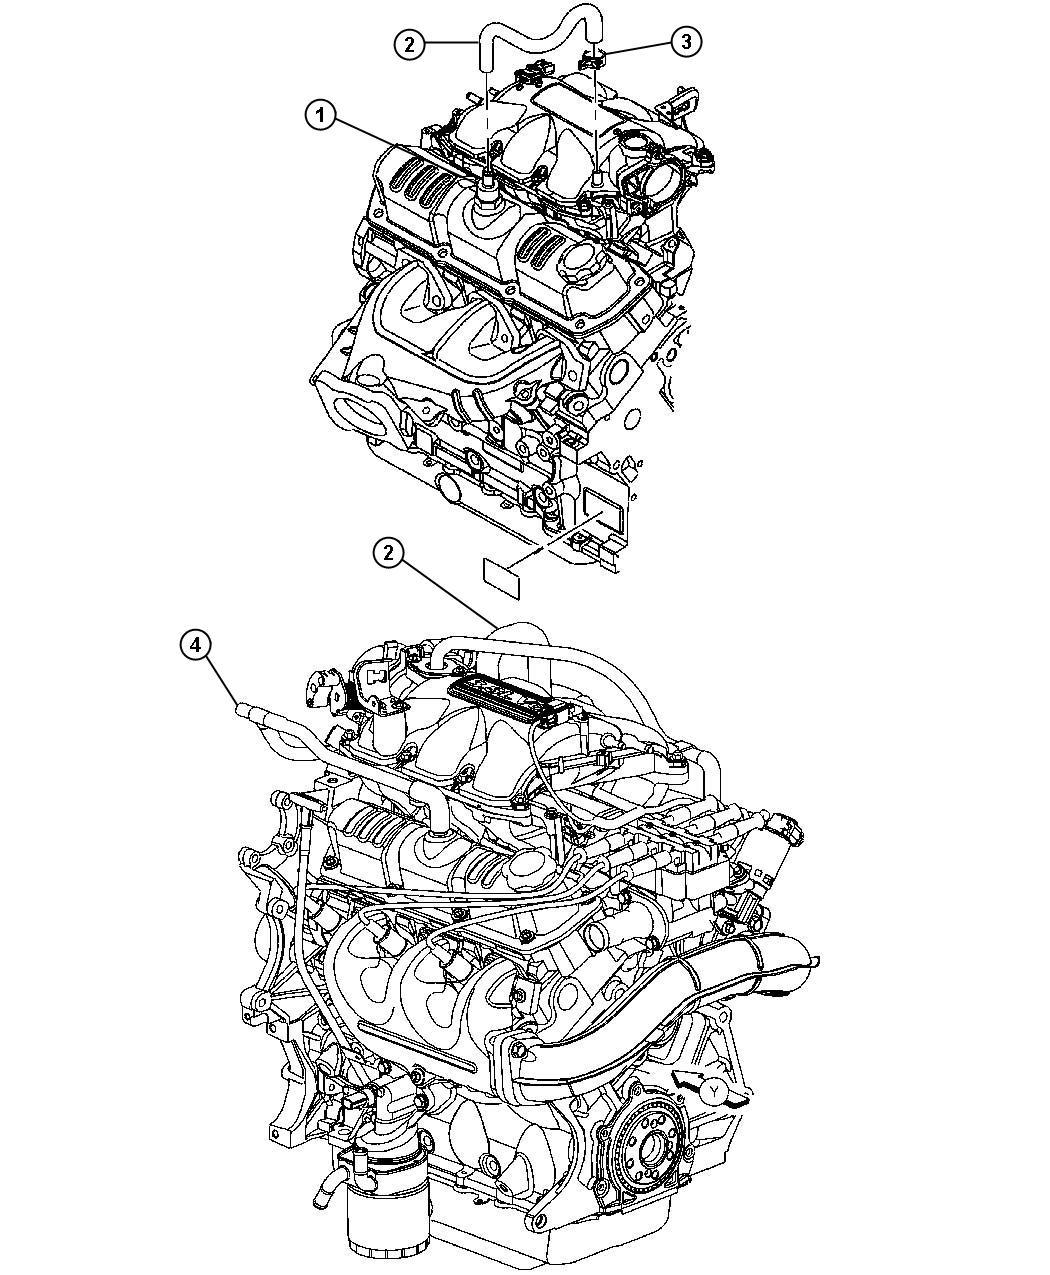 Chrysler Pacifica Crankcase Ventilation 3 8l 3 8l V6